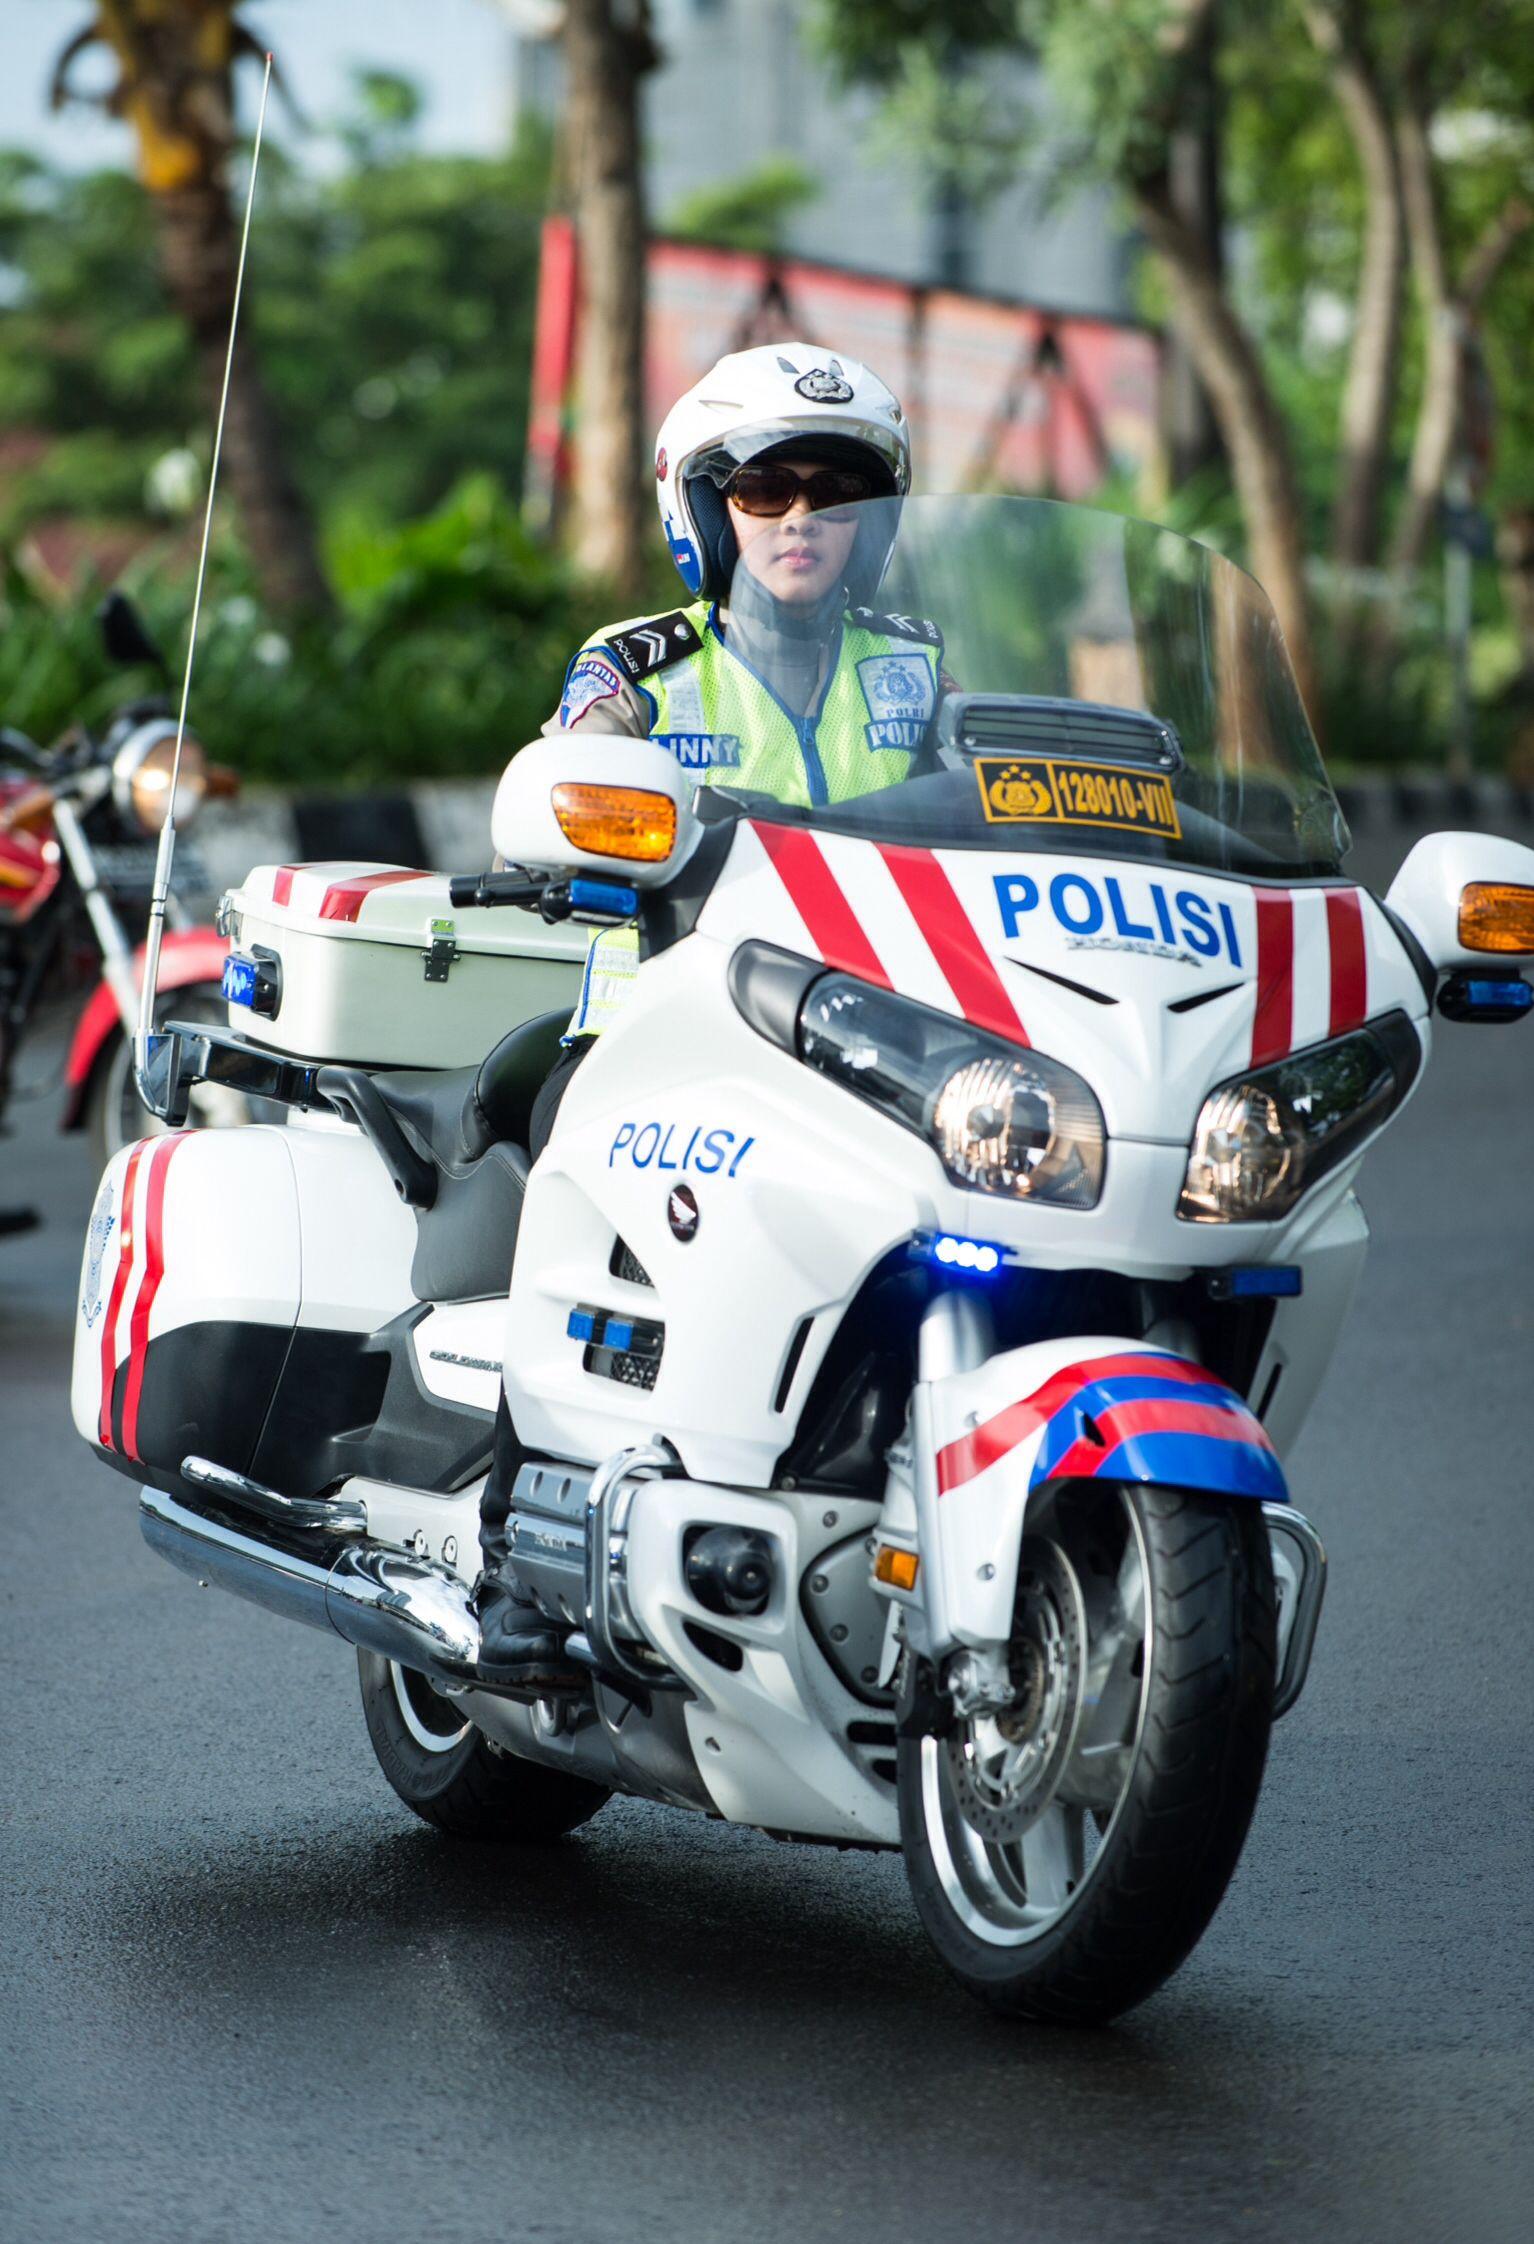 Polisi Wanita Mobil Polisi Polisi Militer